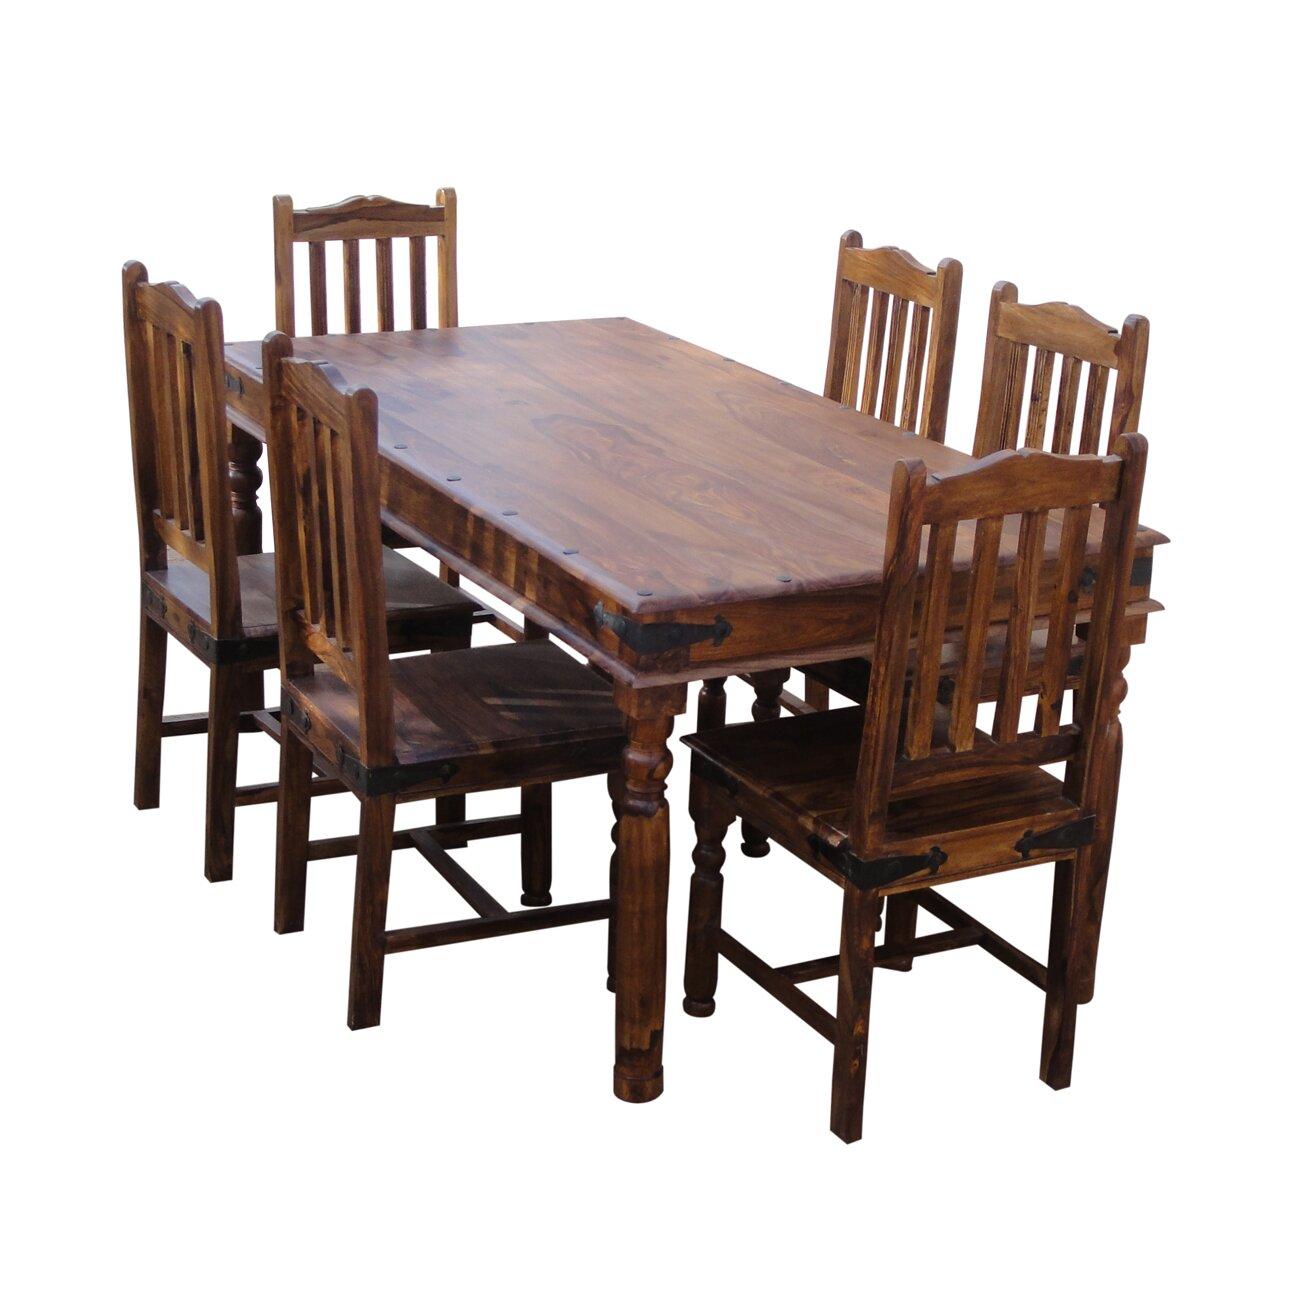 Sheesham Bedroom Furniture Ethnic Elements Ganga Sheesham Dining Set With 6 Chairs Reviews